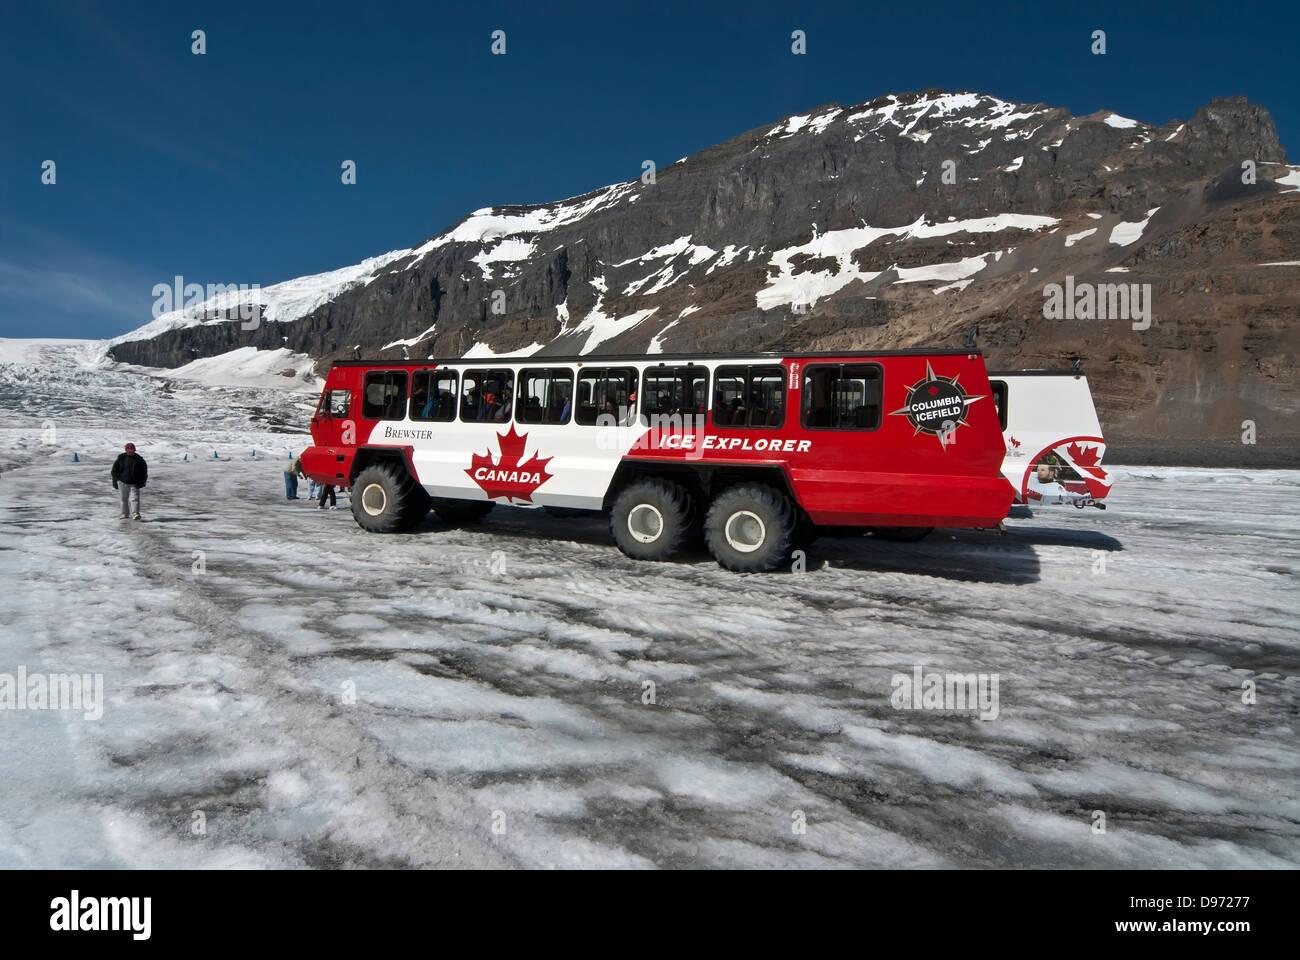 Ice Explorer am Athabasca Gletscher, Kanadische Rockies Stockbild